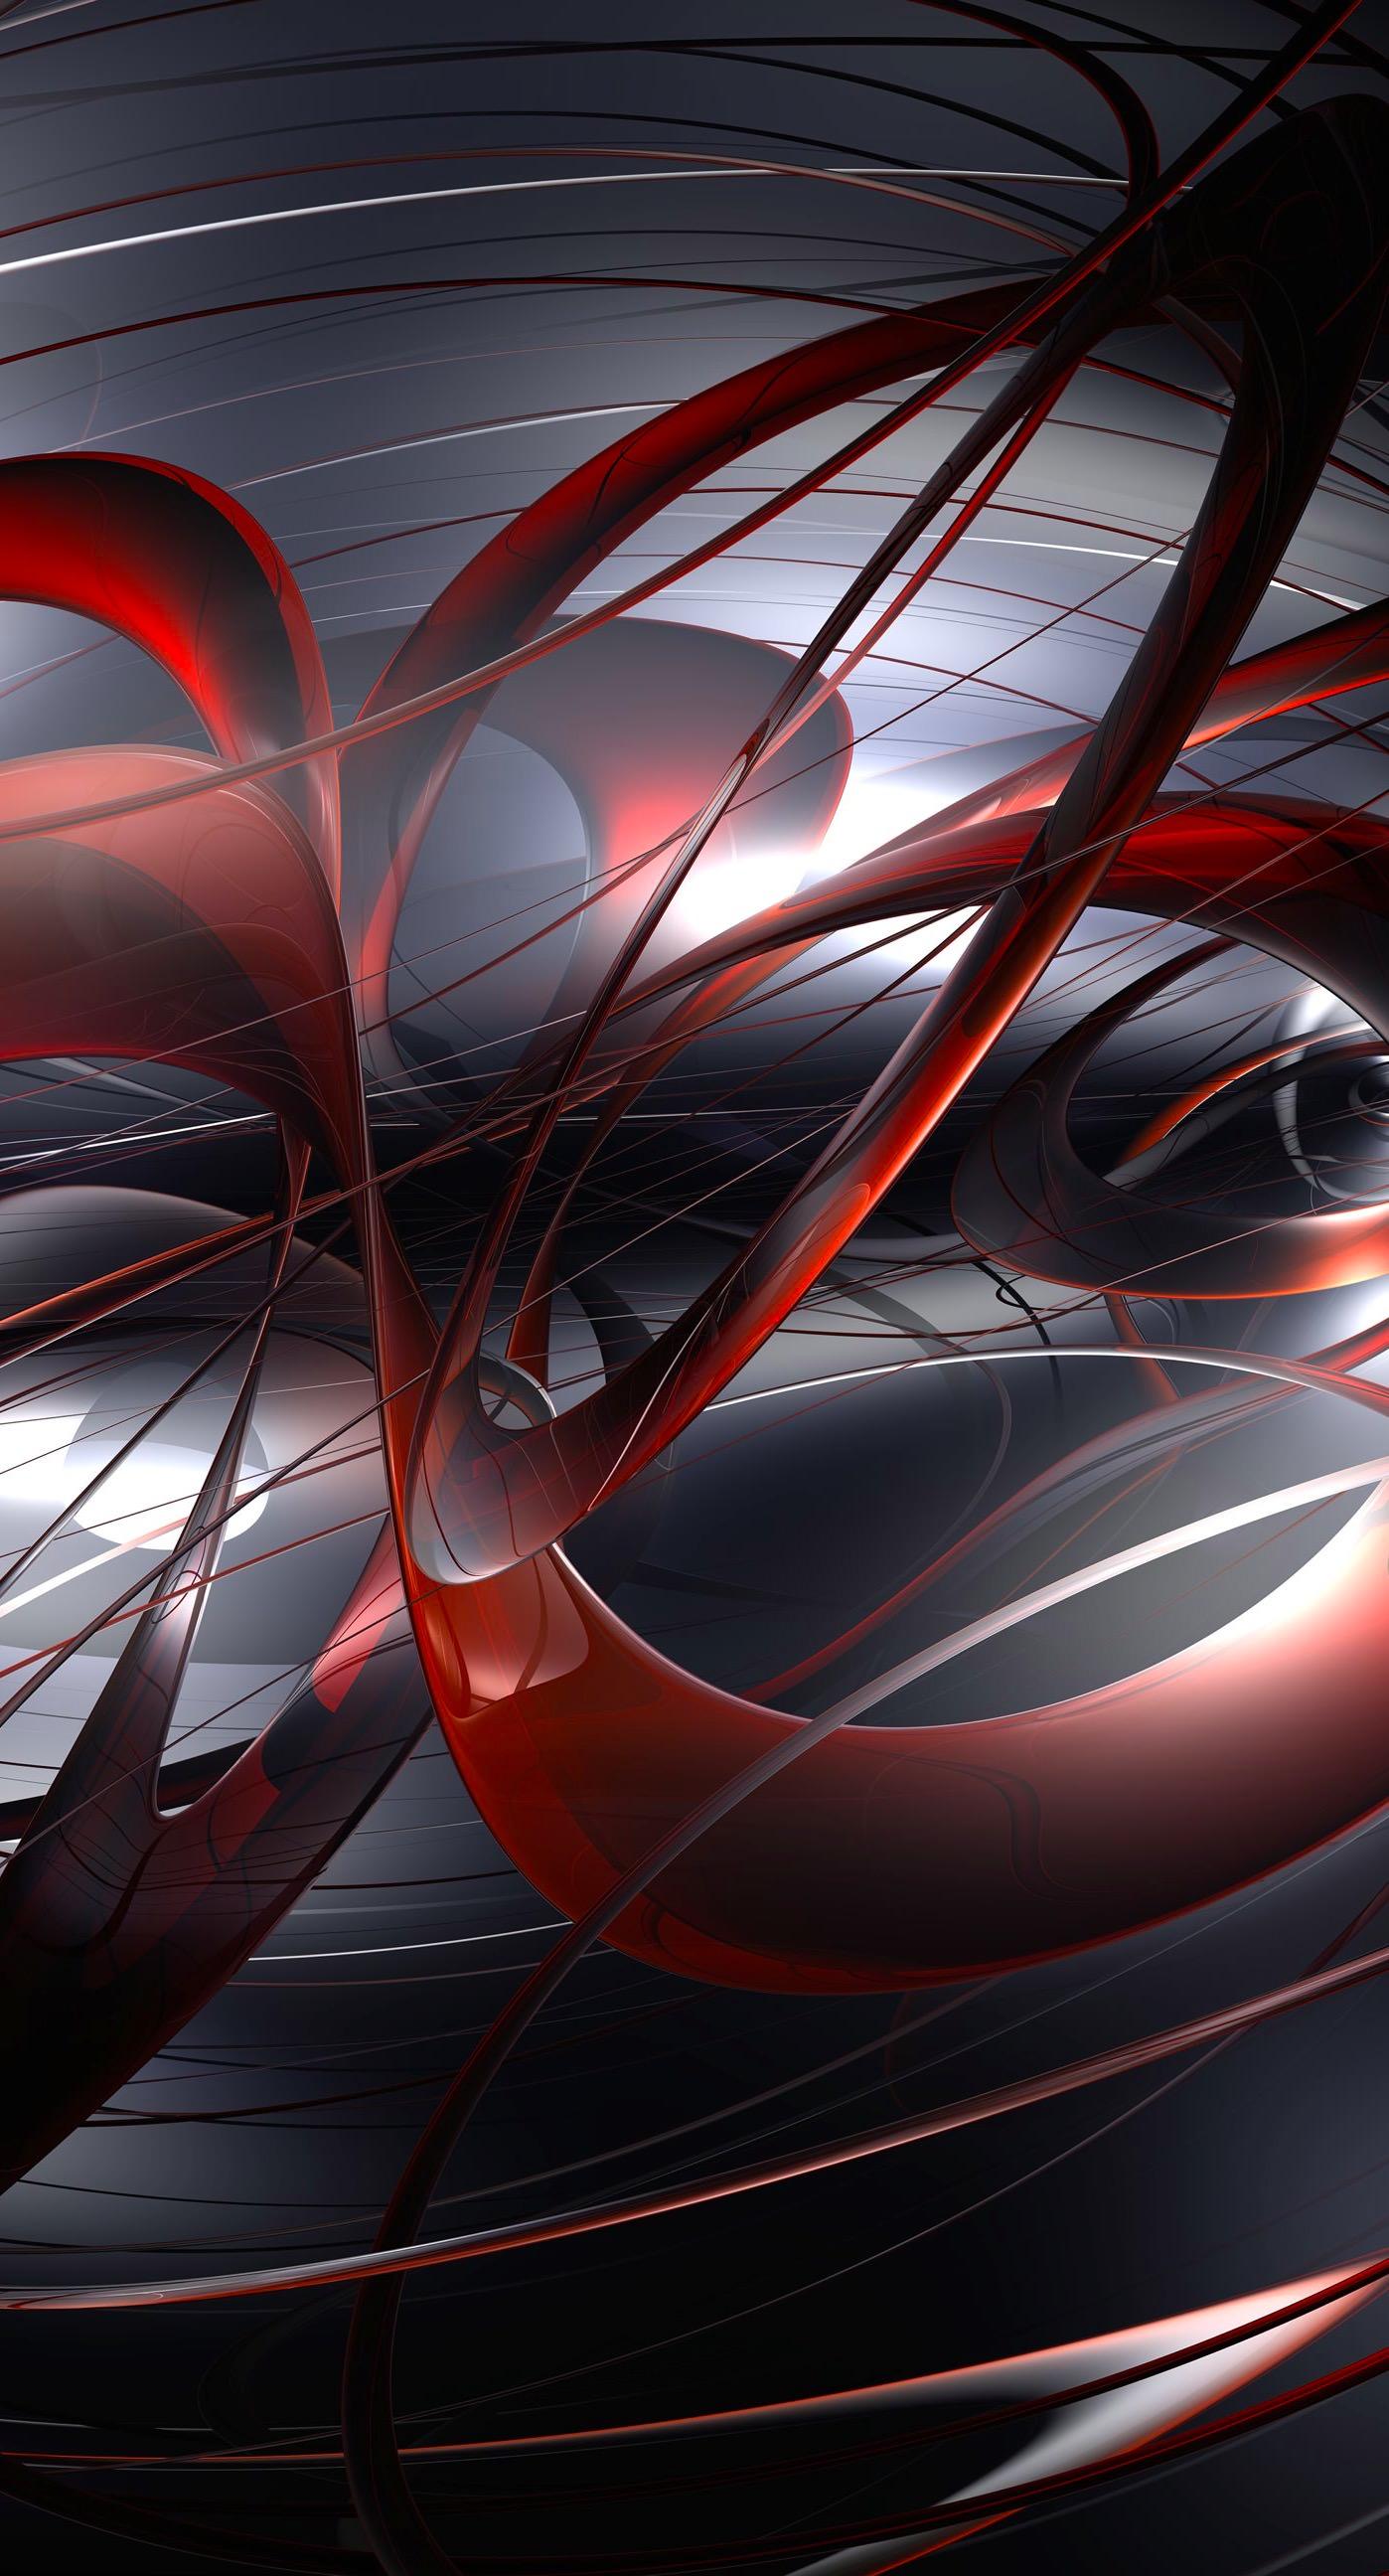 Pattern black red 3D Cool | wallpaper.sc iPhone6sPlus